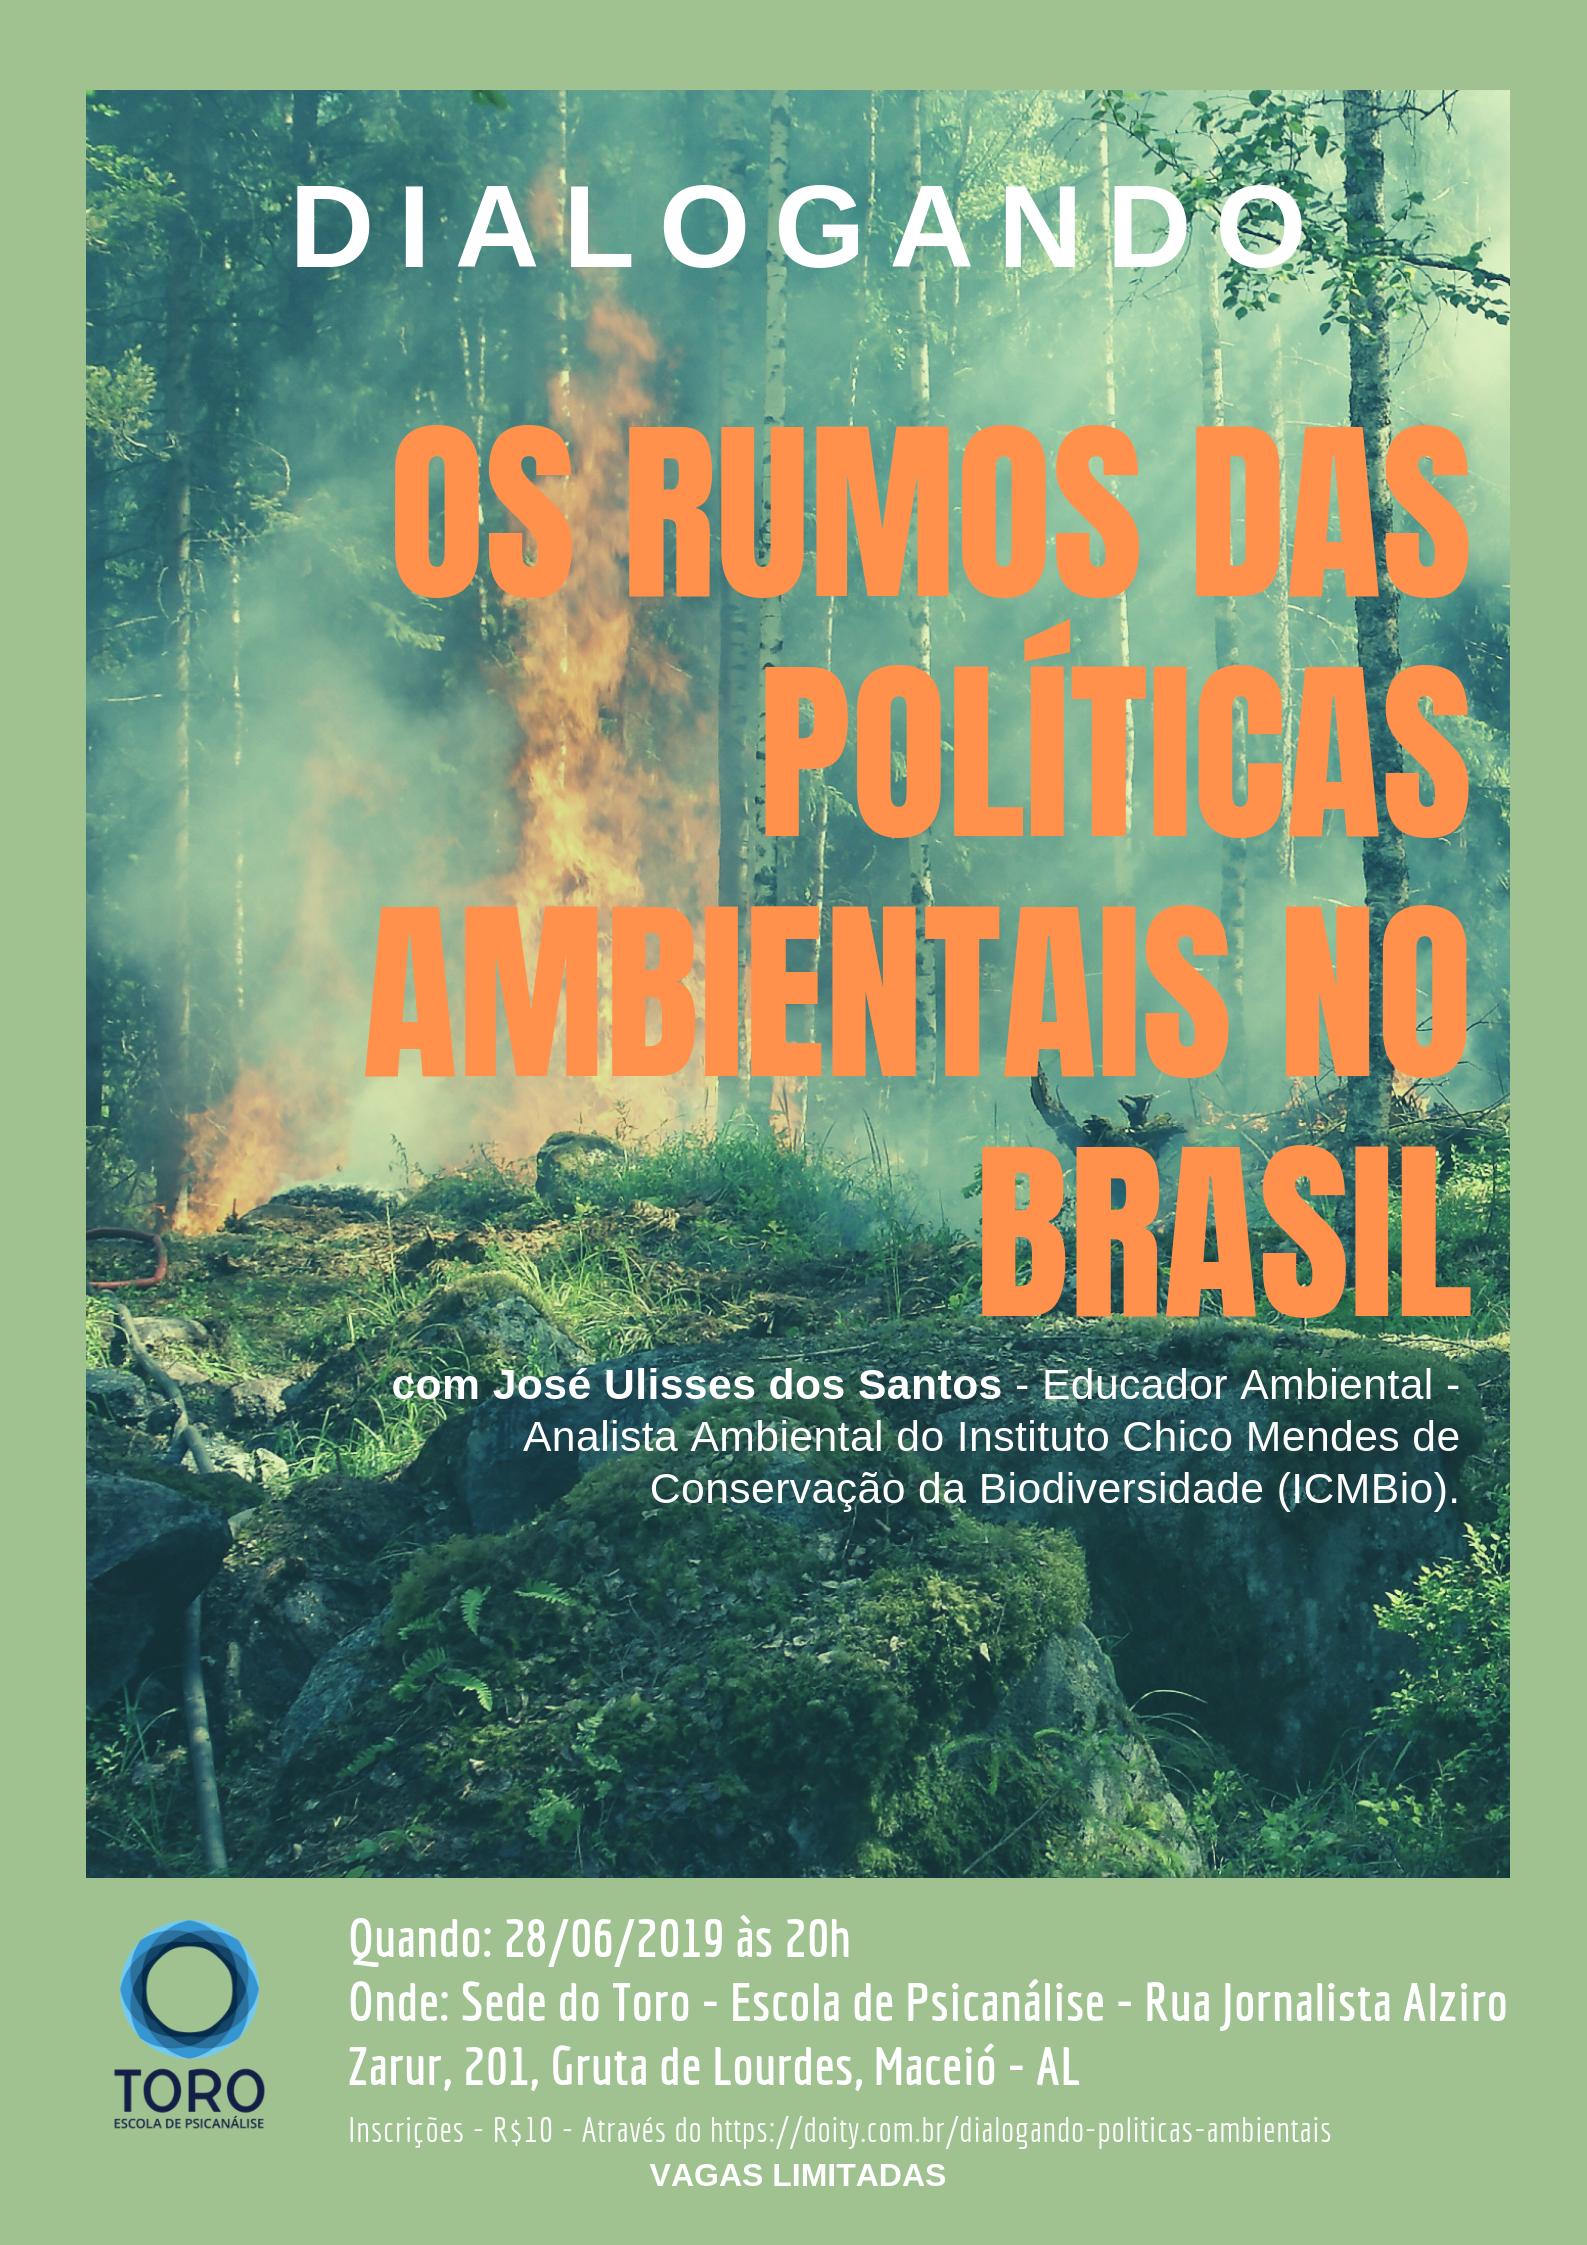 Copia de os rumos das politicas ambientais no brasil